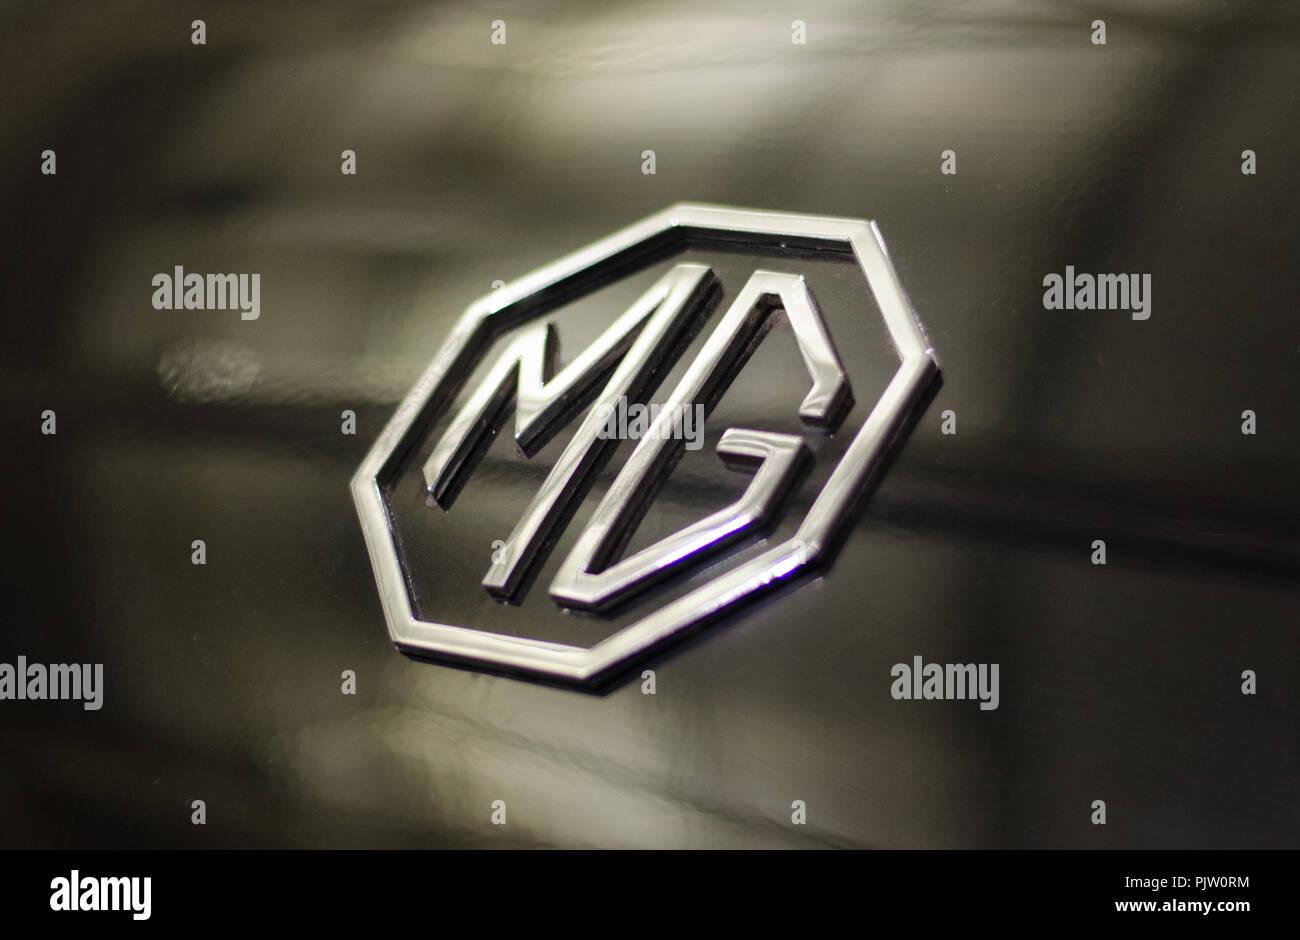 MG logo - Stock Image